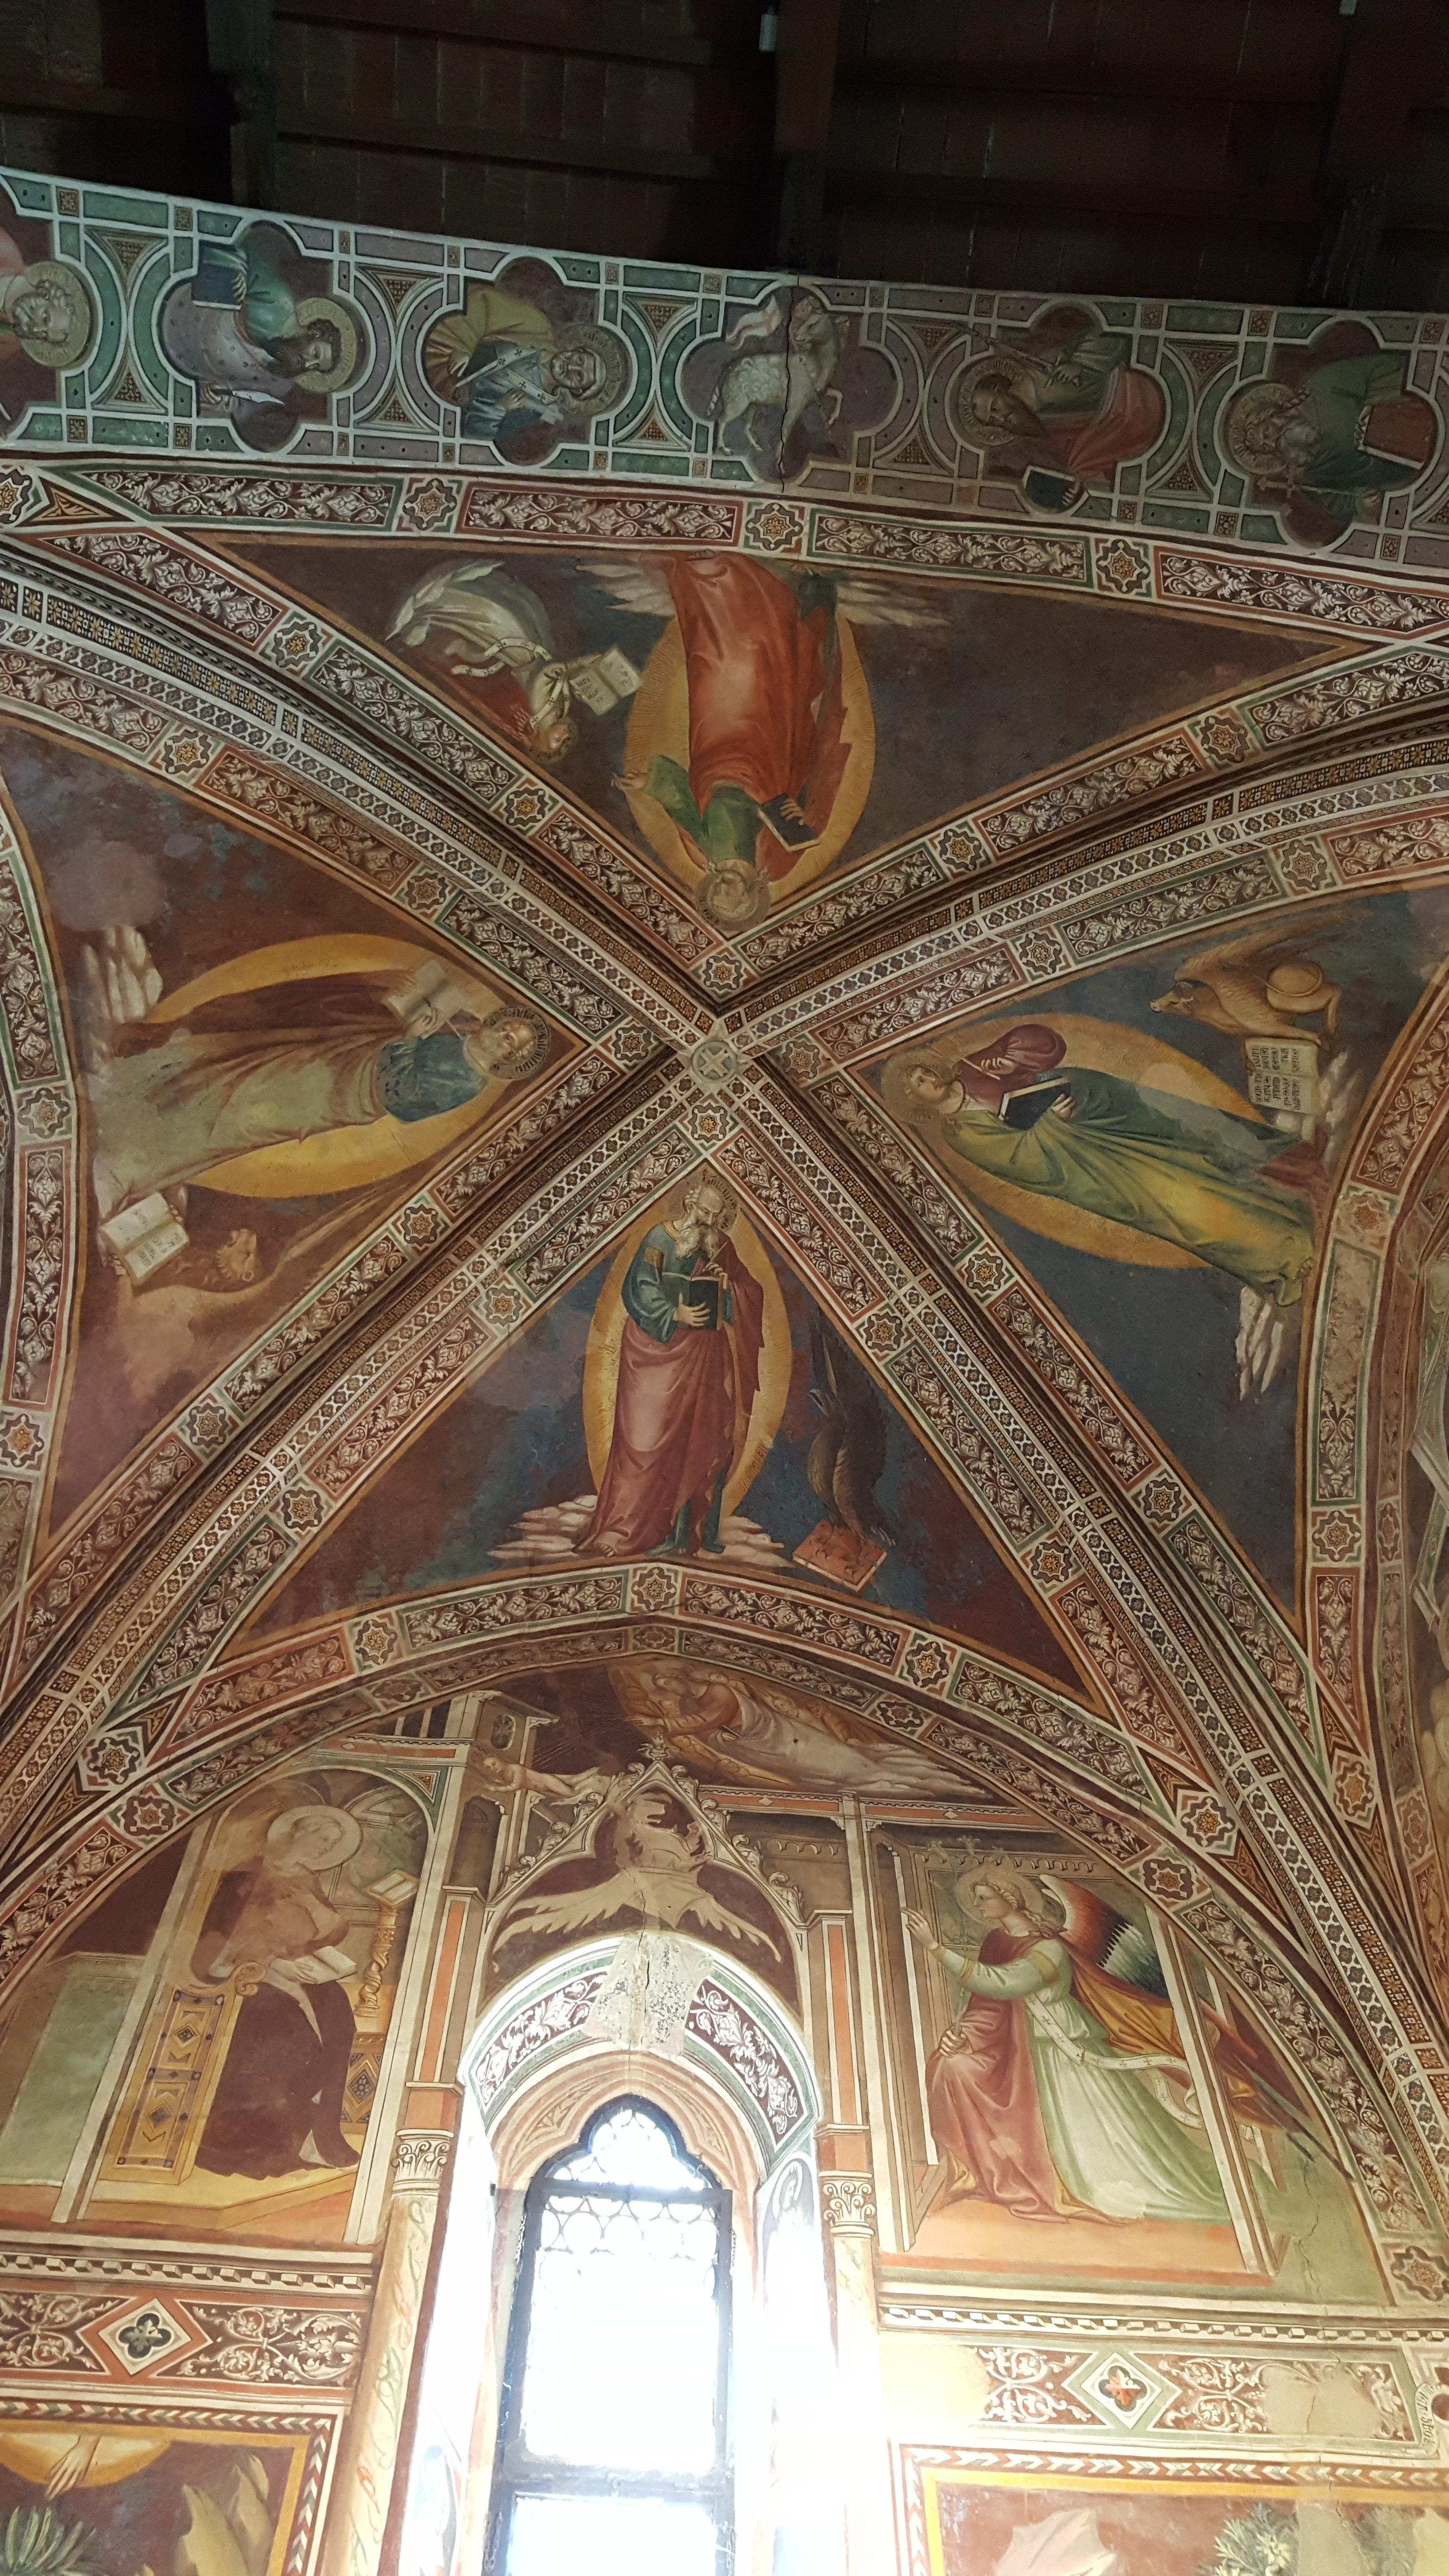 affreschi volta a vela chiesa sant'antonio abate pescia